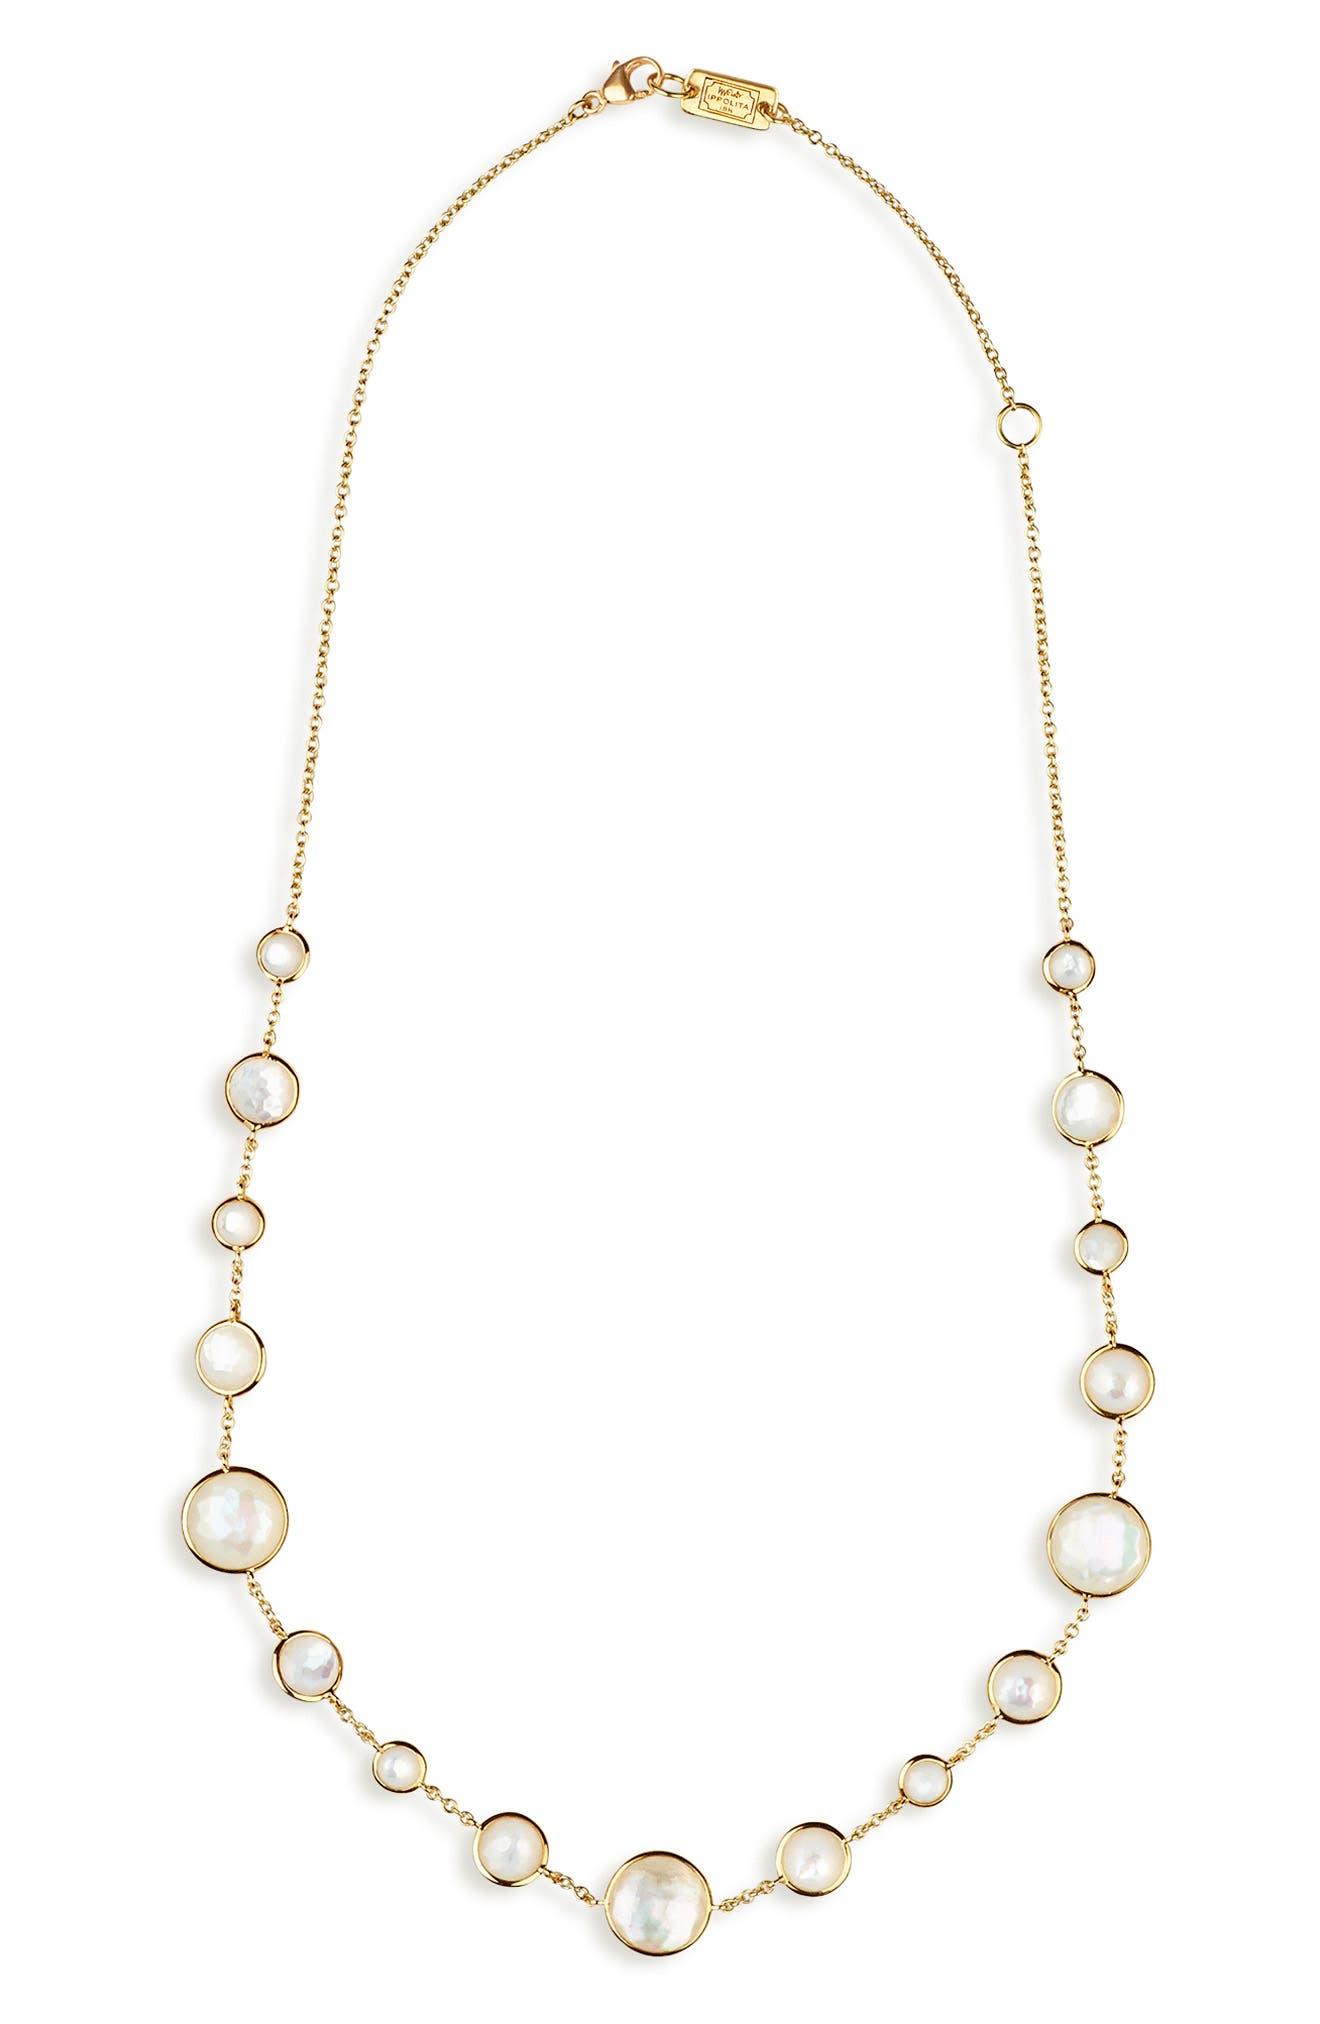 Lollipop Lollitini Necklace,                         Main,                         color, GOLD/ PEARLS